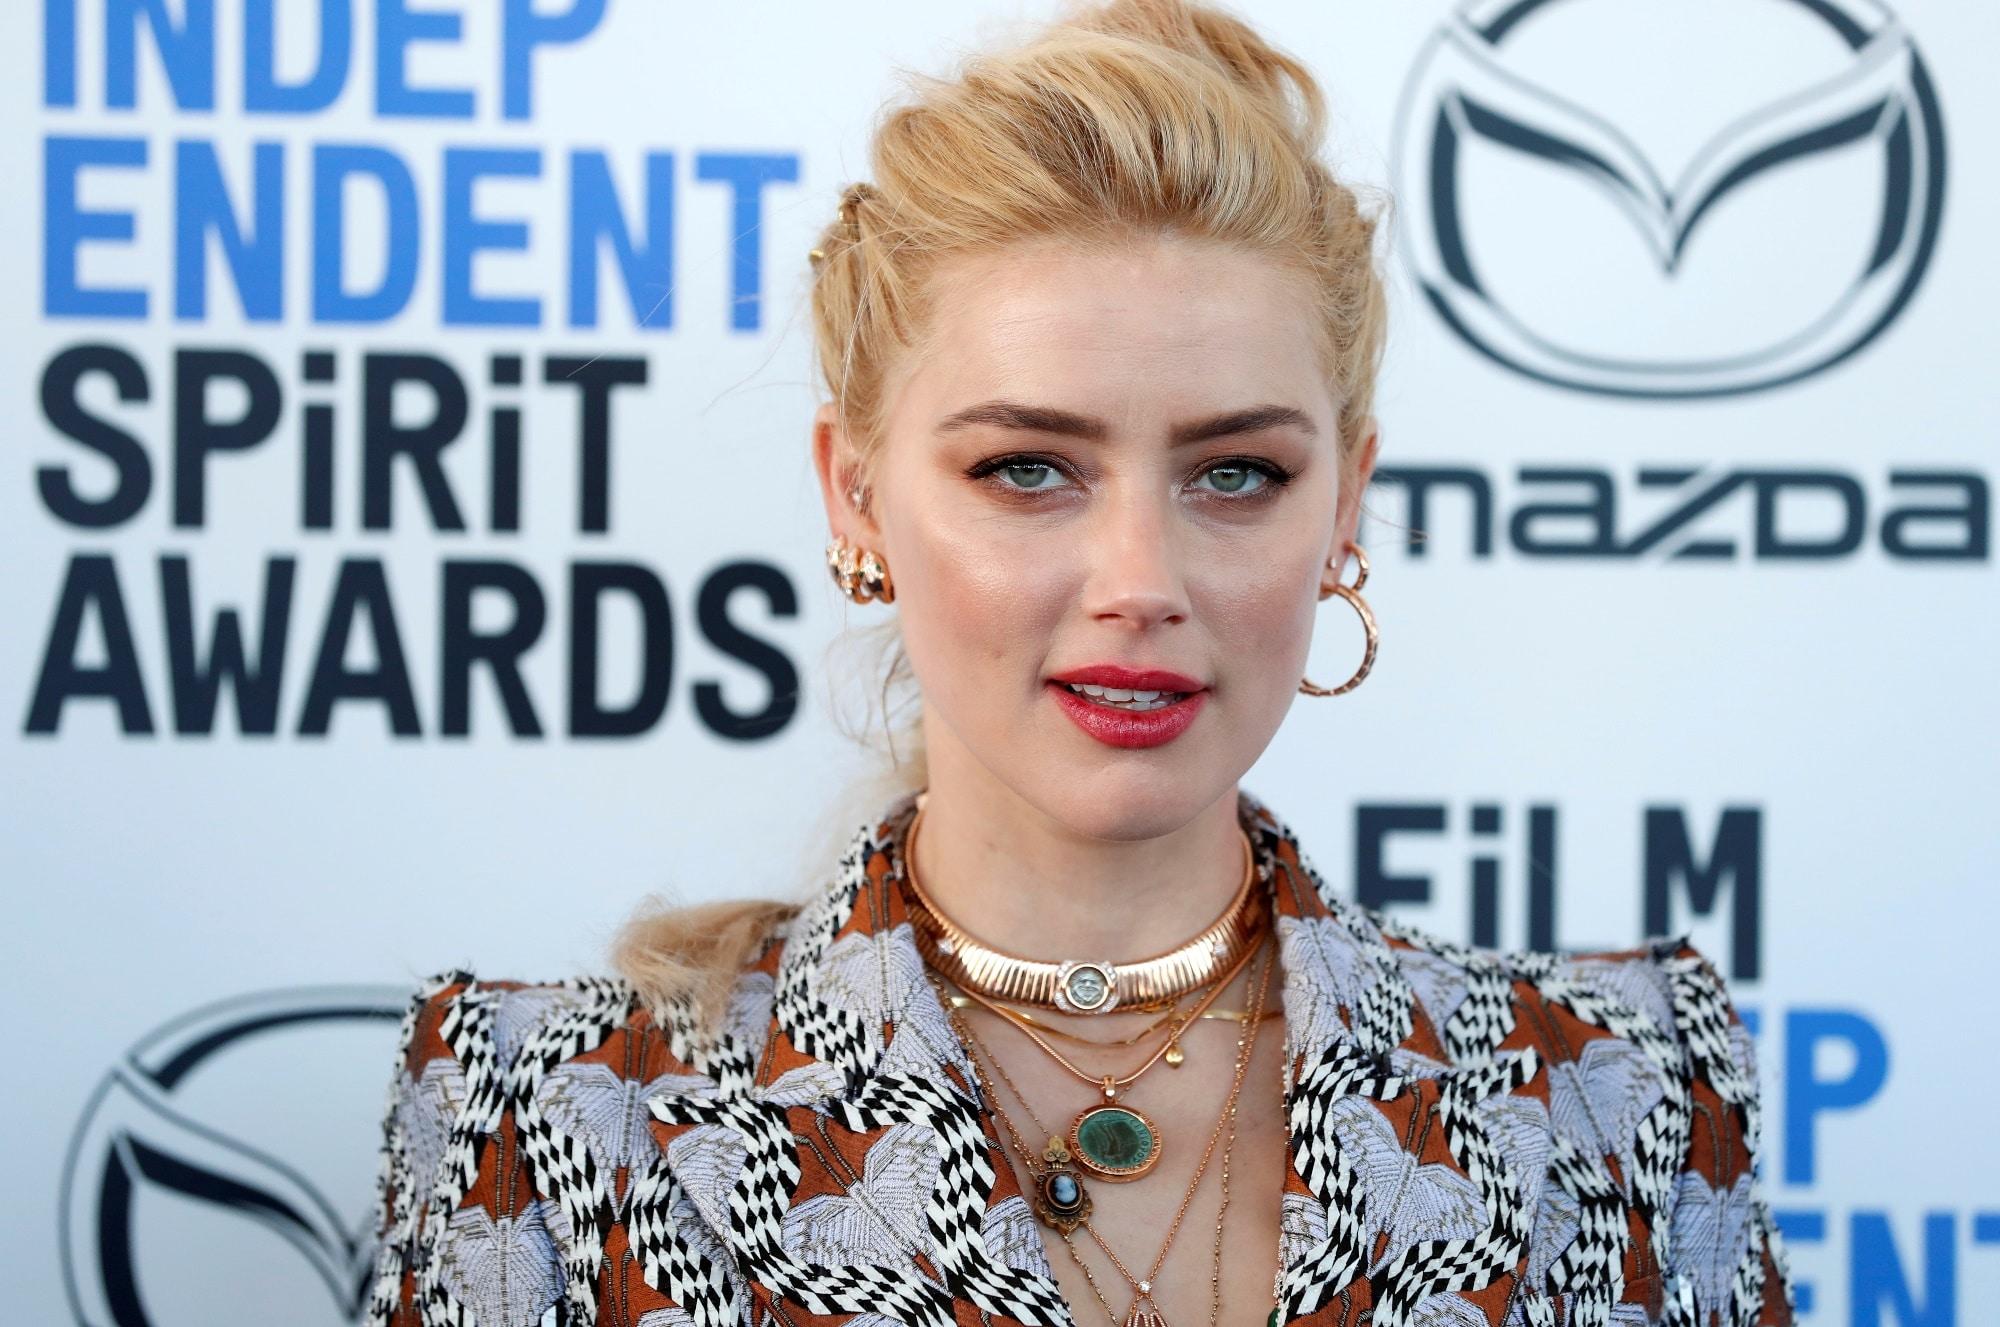 Herečka Amber Heard se stala matkou